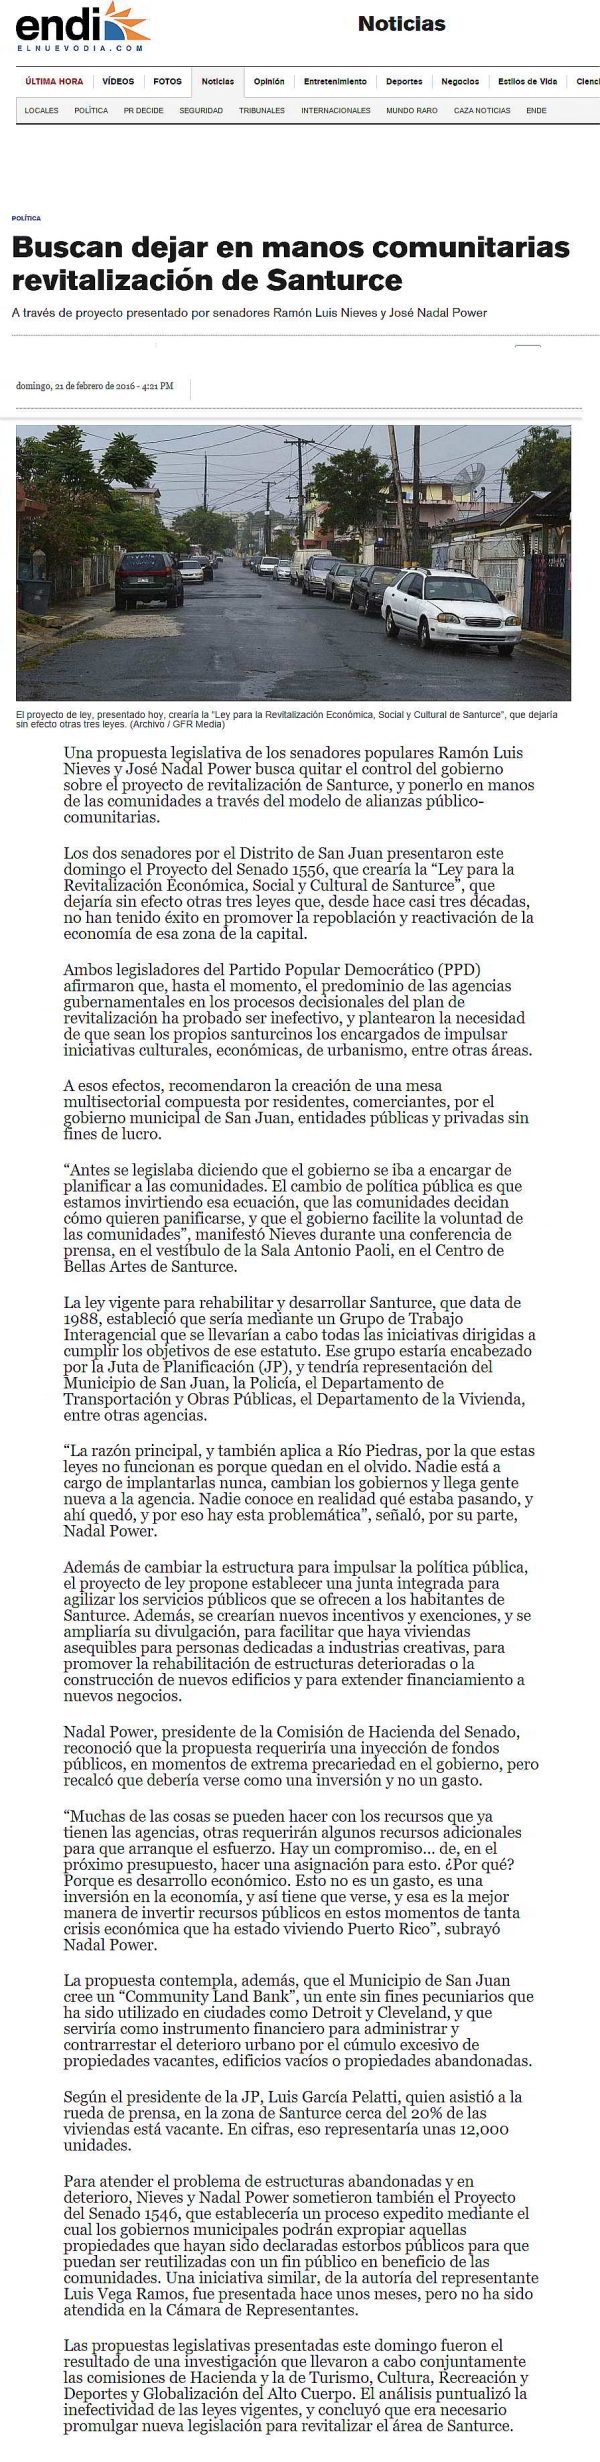 Revitalización de Santurce-ENDI-autogiro arte actual